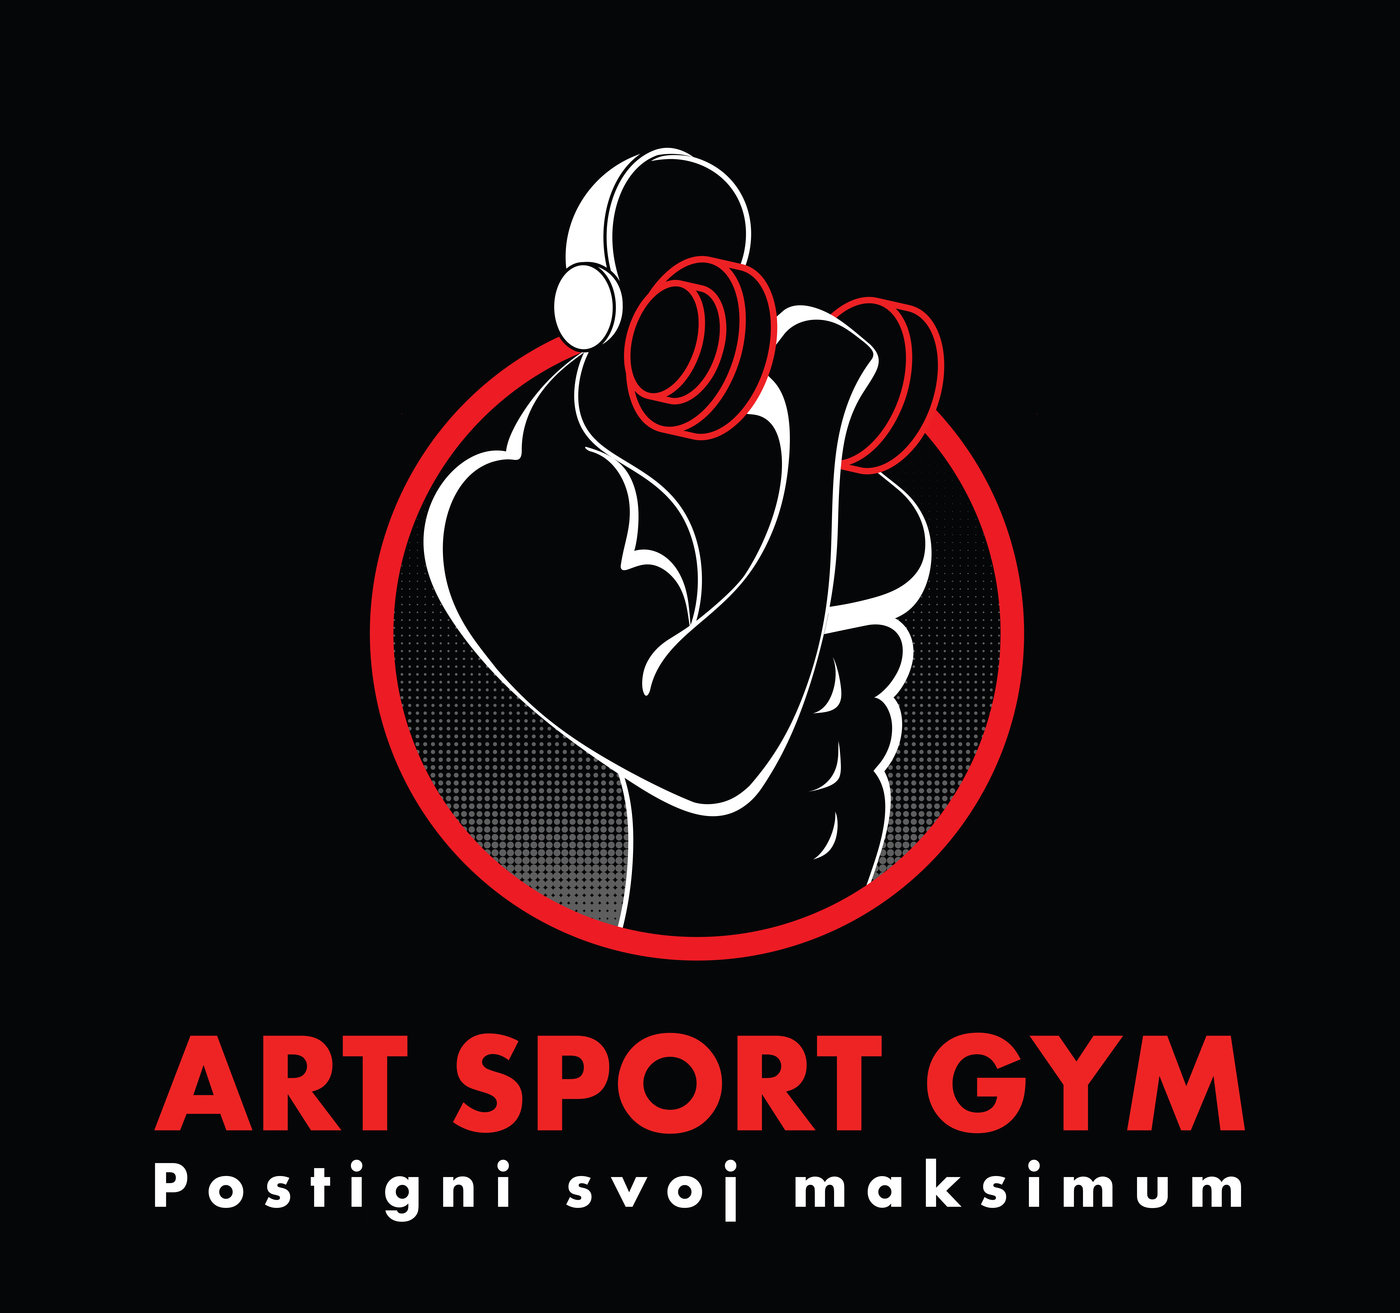 GYM LOGO, VISUAL IDENTITY By Kosan Stanojevic At Coroflot.com